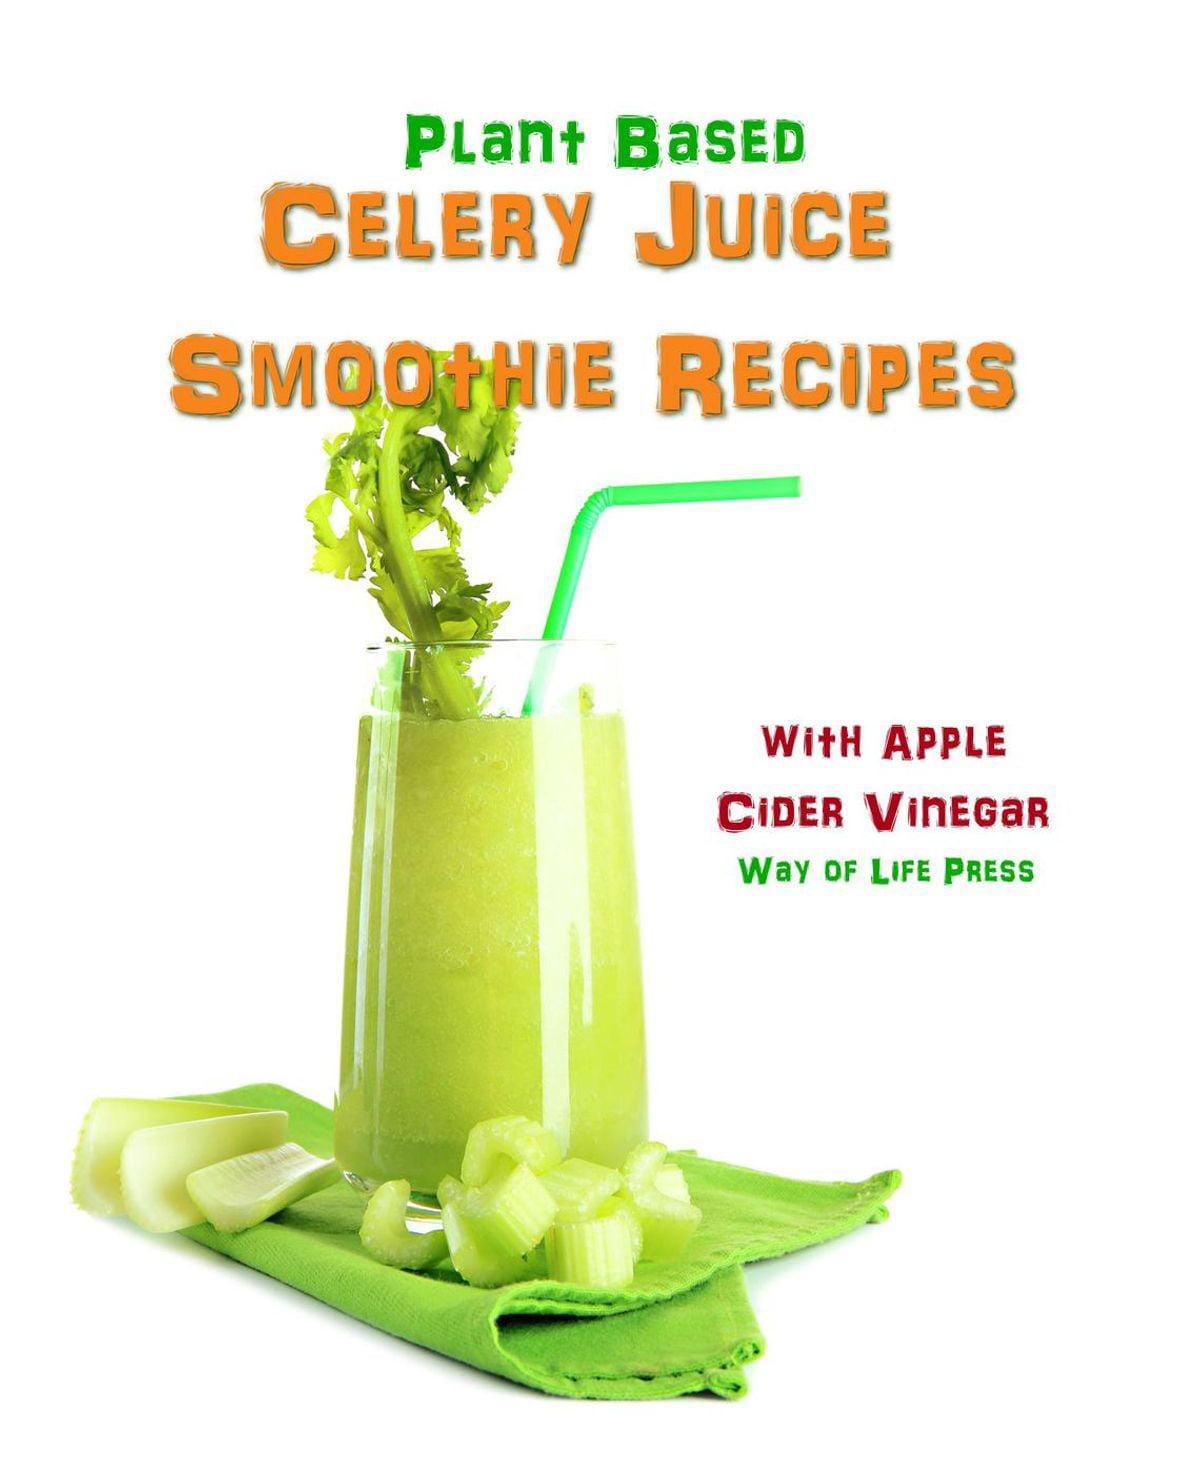 Plant Based Celery Juice Smoothie Recipes